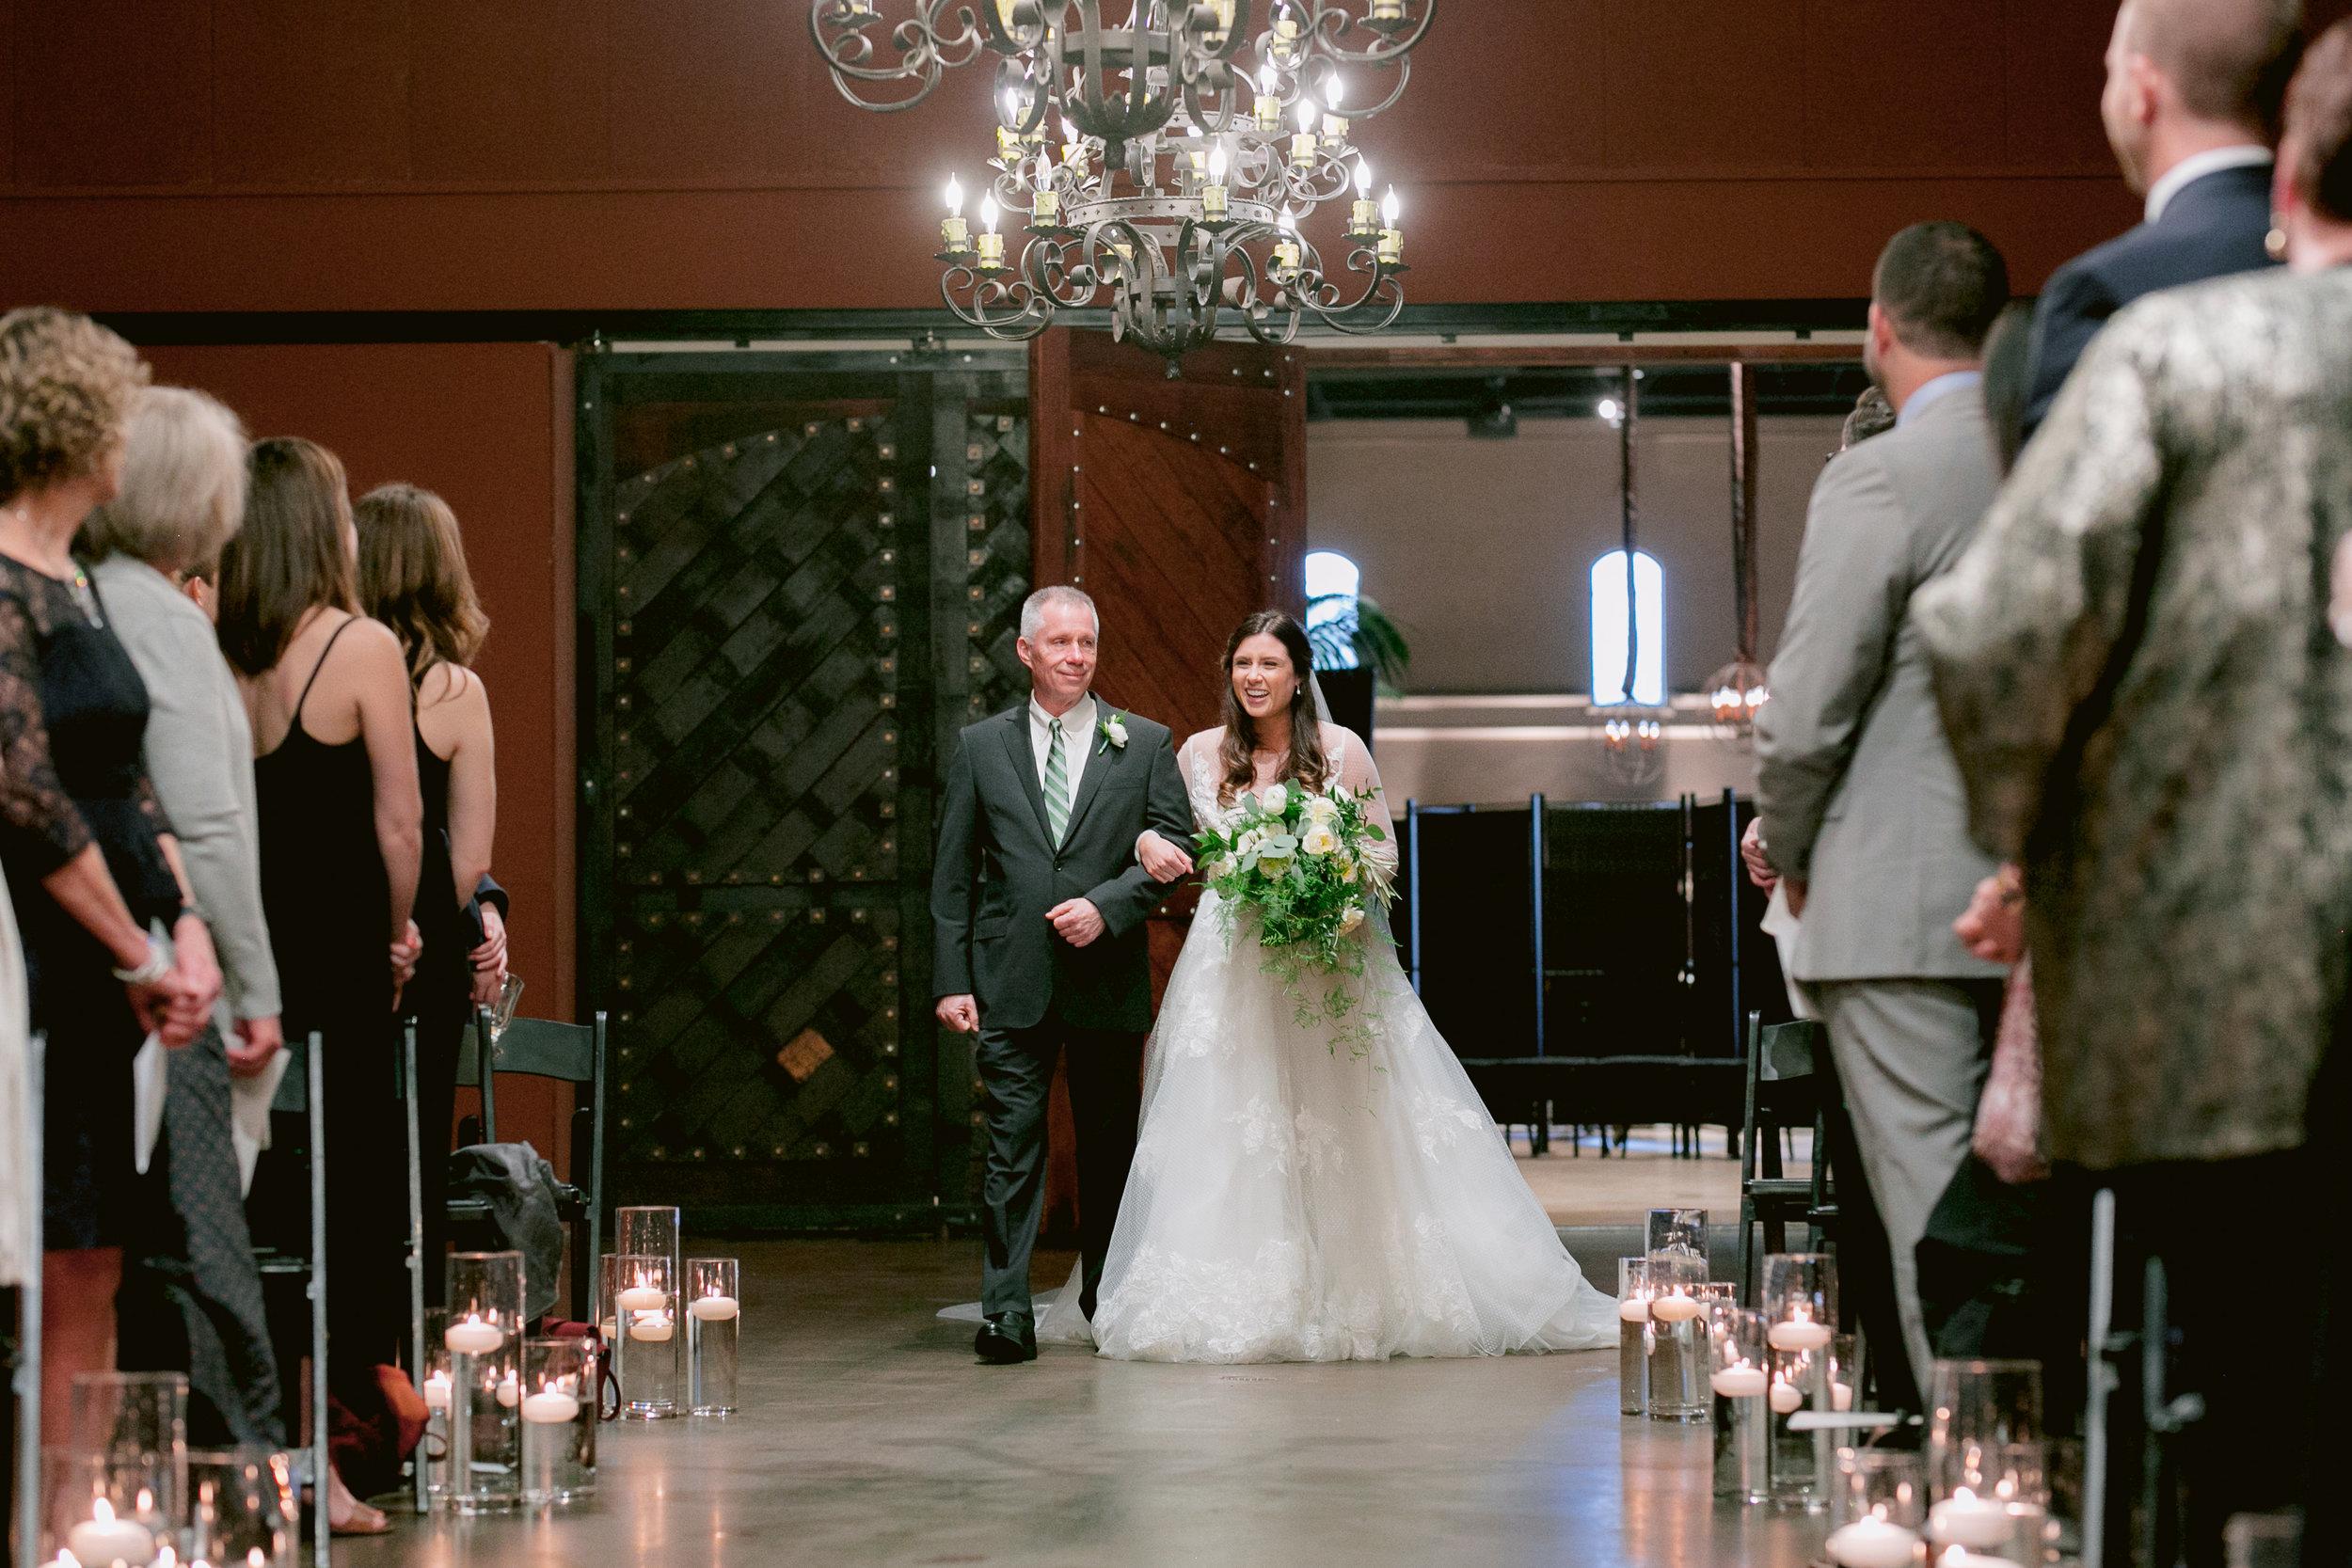 Palm_Event_Center_Wedding_004.jpg